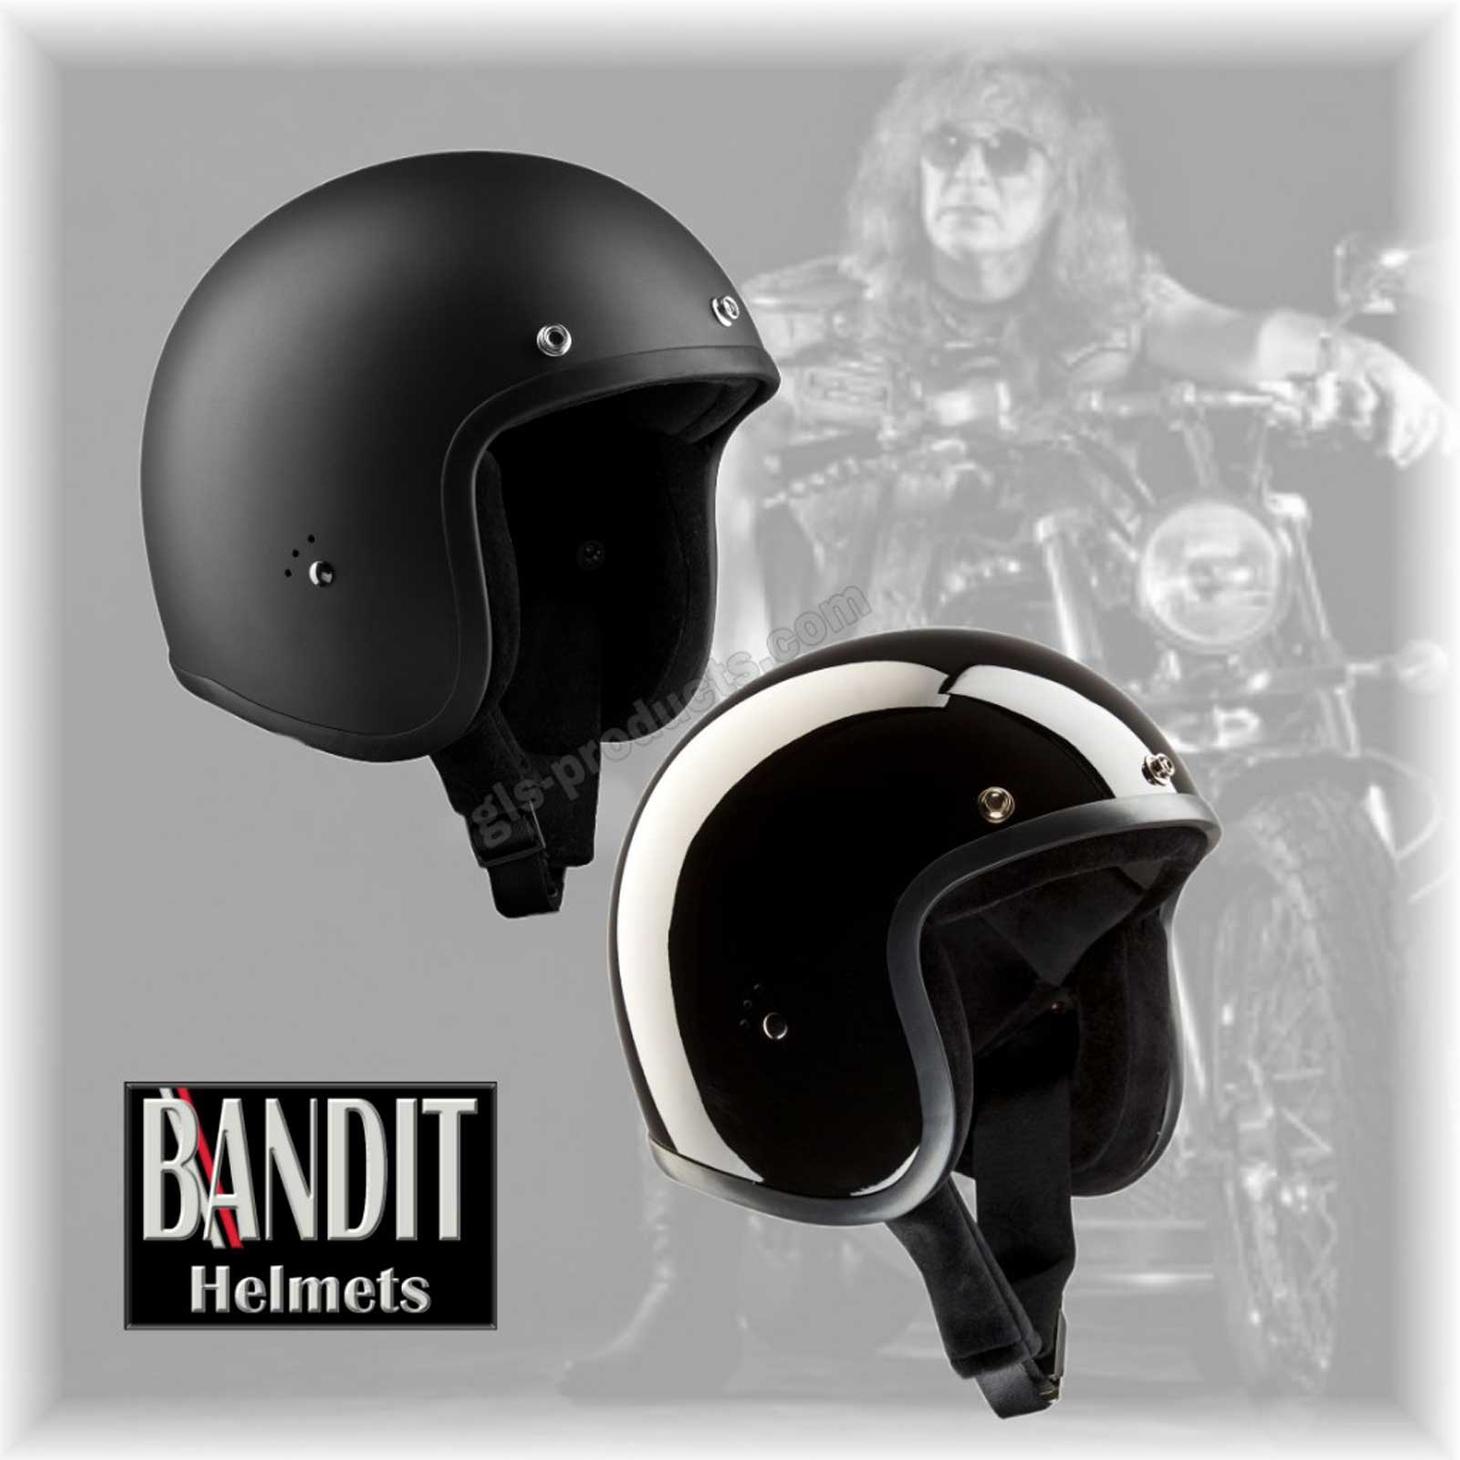 Bandit Jet Helmet - Glossy Black Motorcycle Open Face Helmet – Picture 9